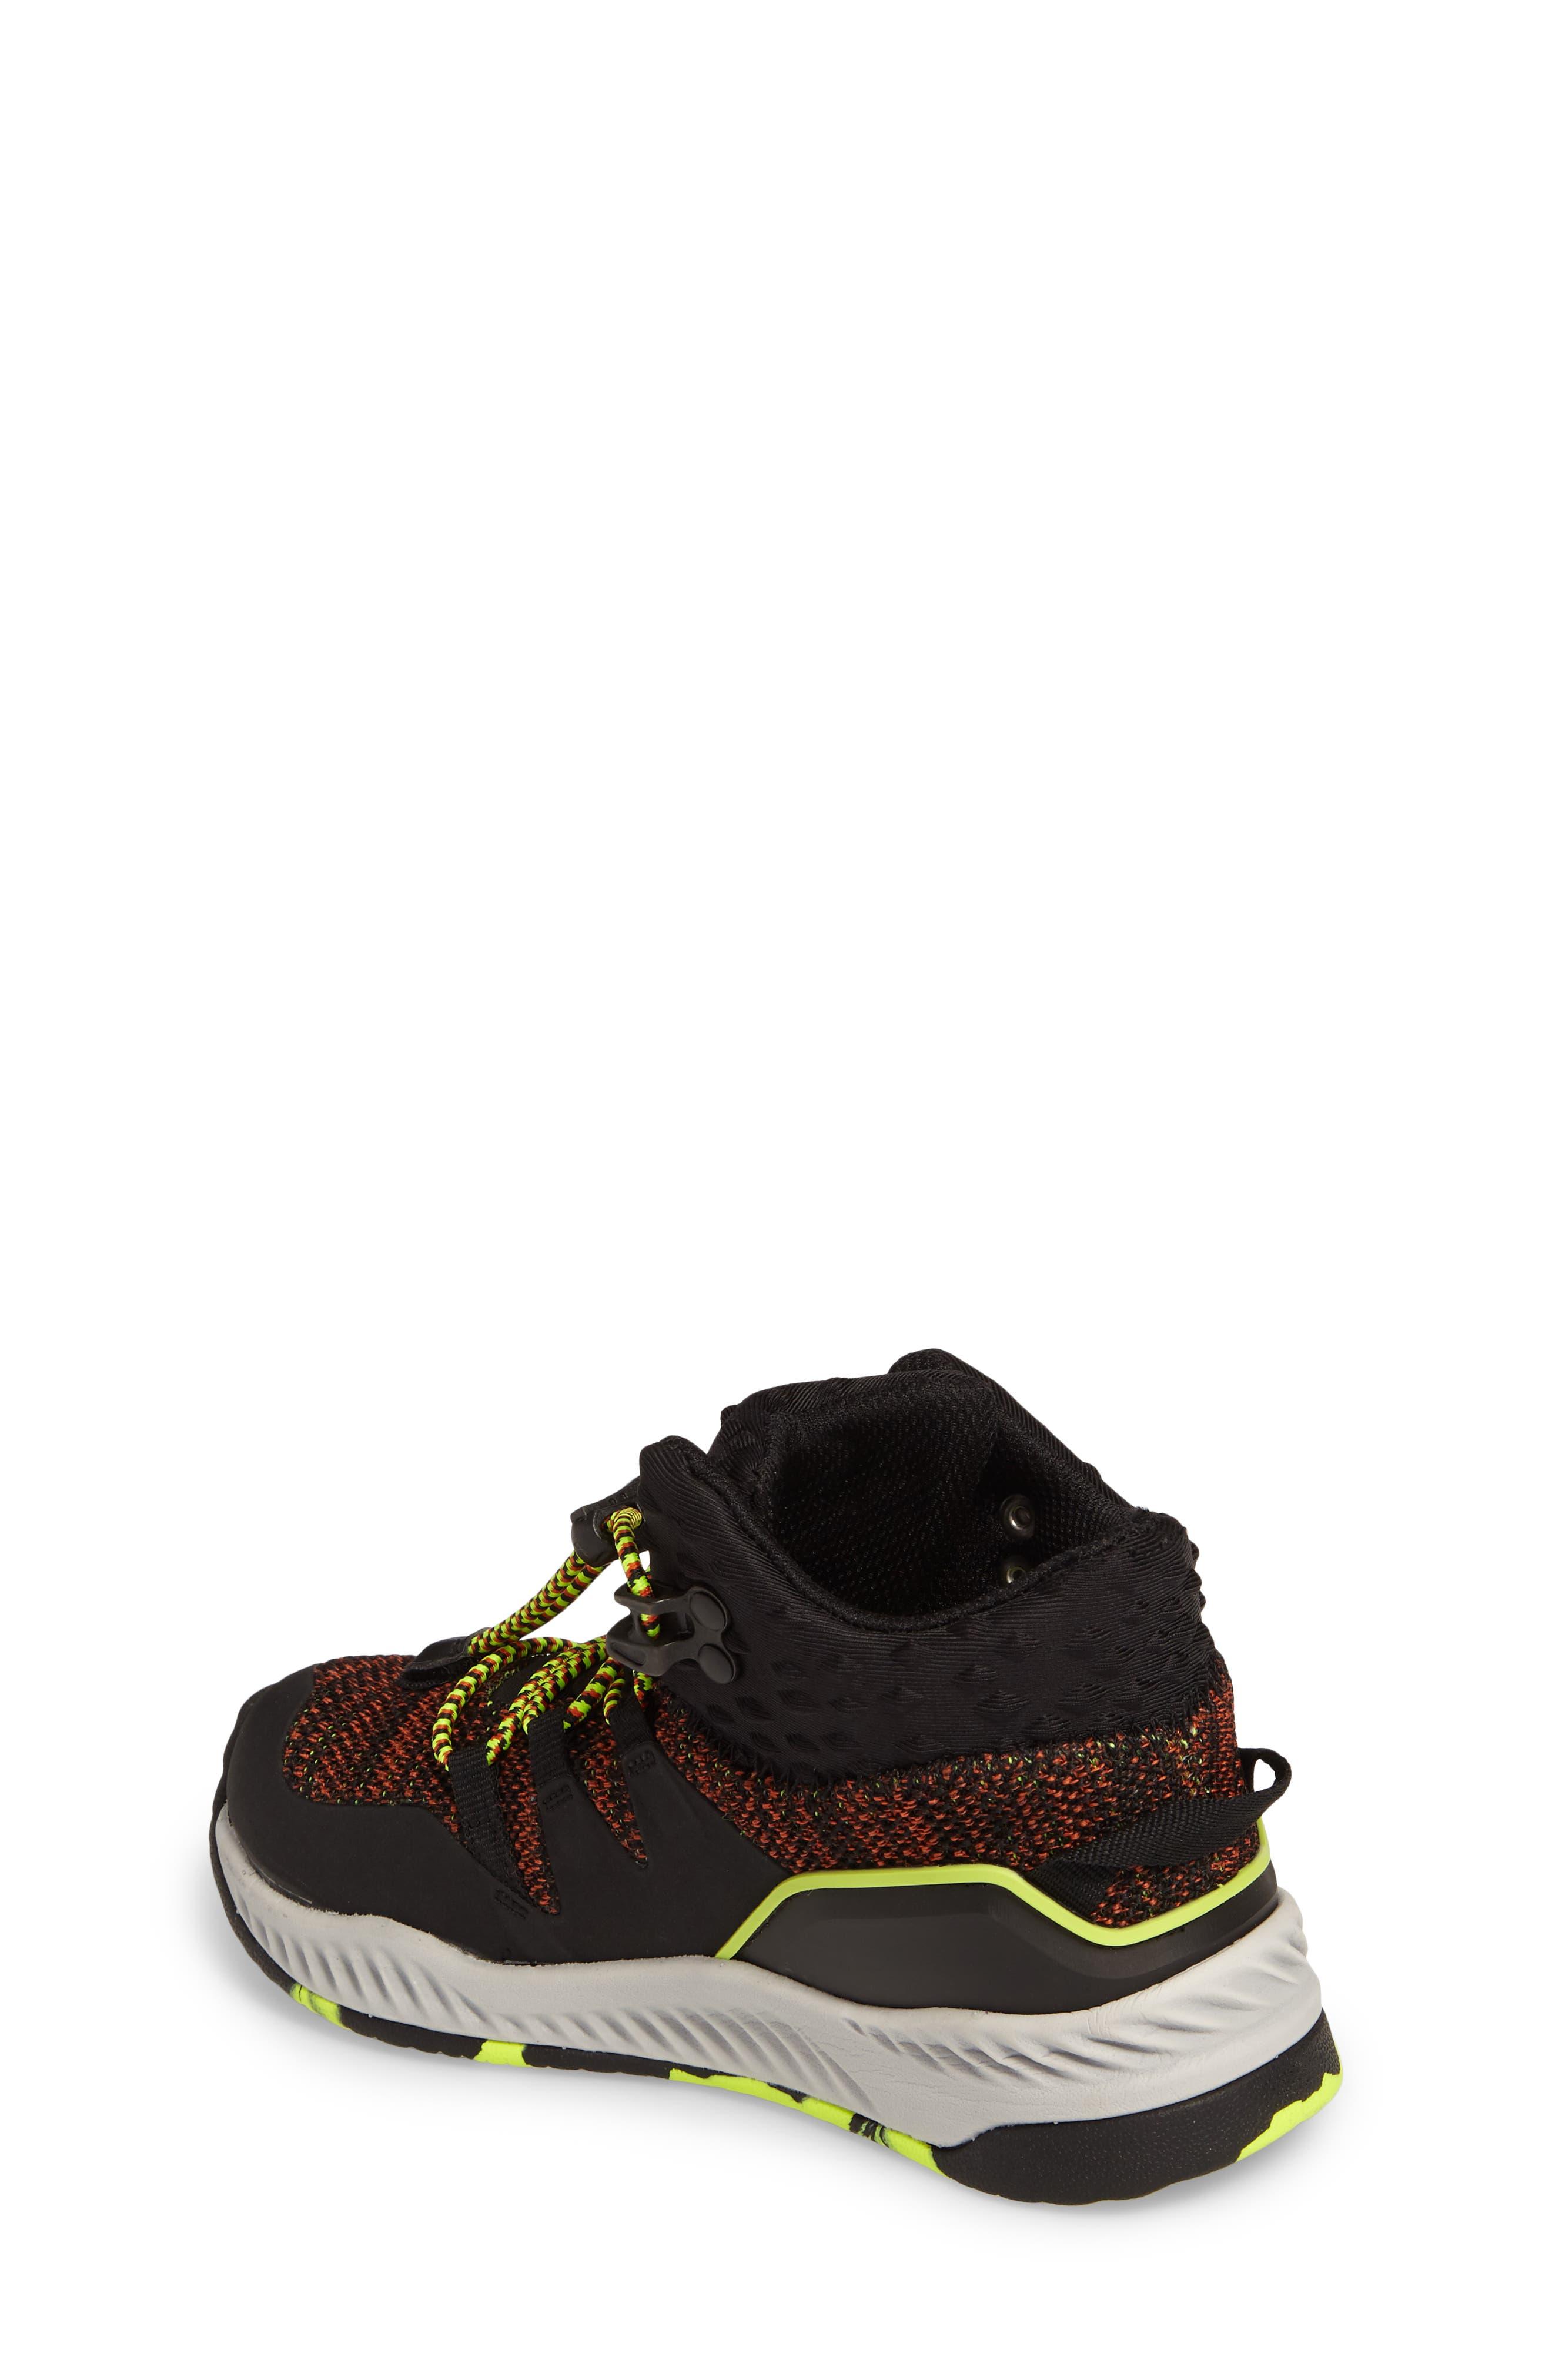 Armadillo Sneaker Boot,                             Alternate thumbnail 2, color,                             Black